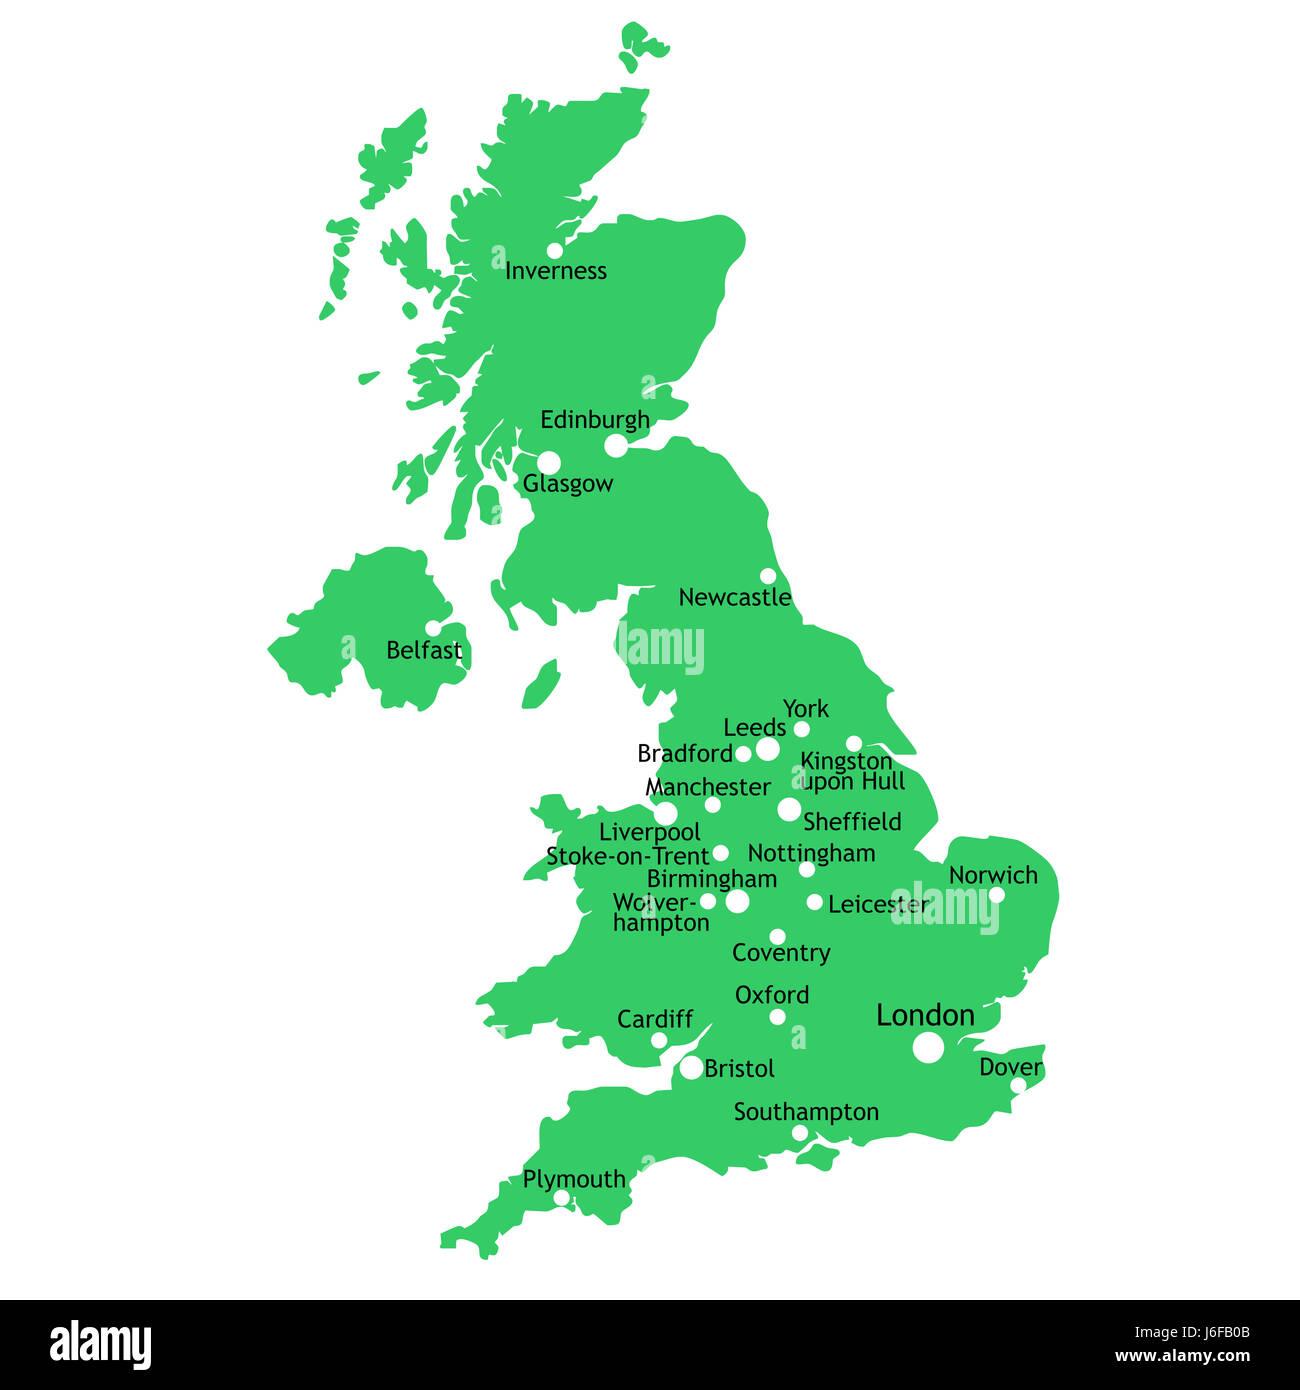 London Atlas Map.Cities London Britain United Kingdom Map Atlas Map Of The World